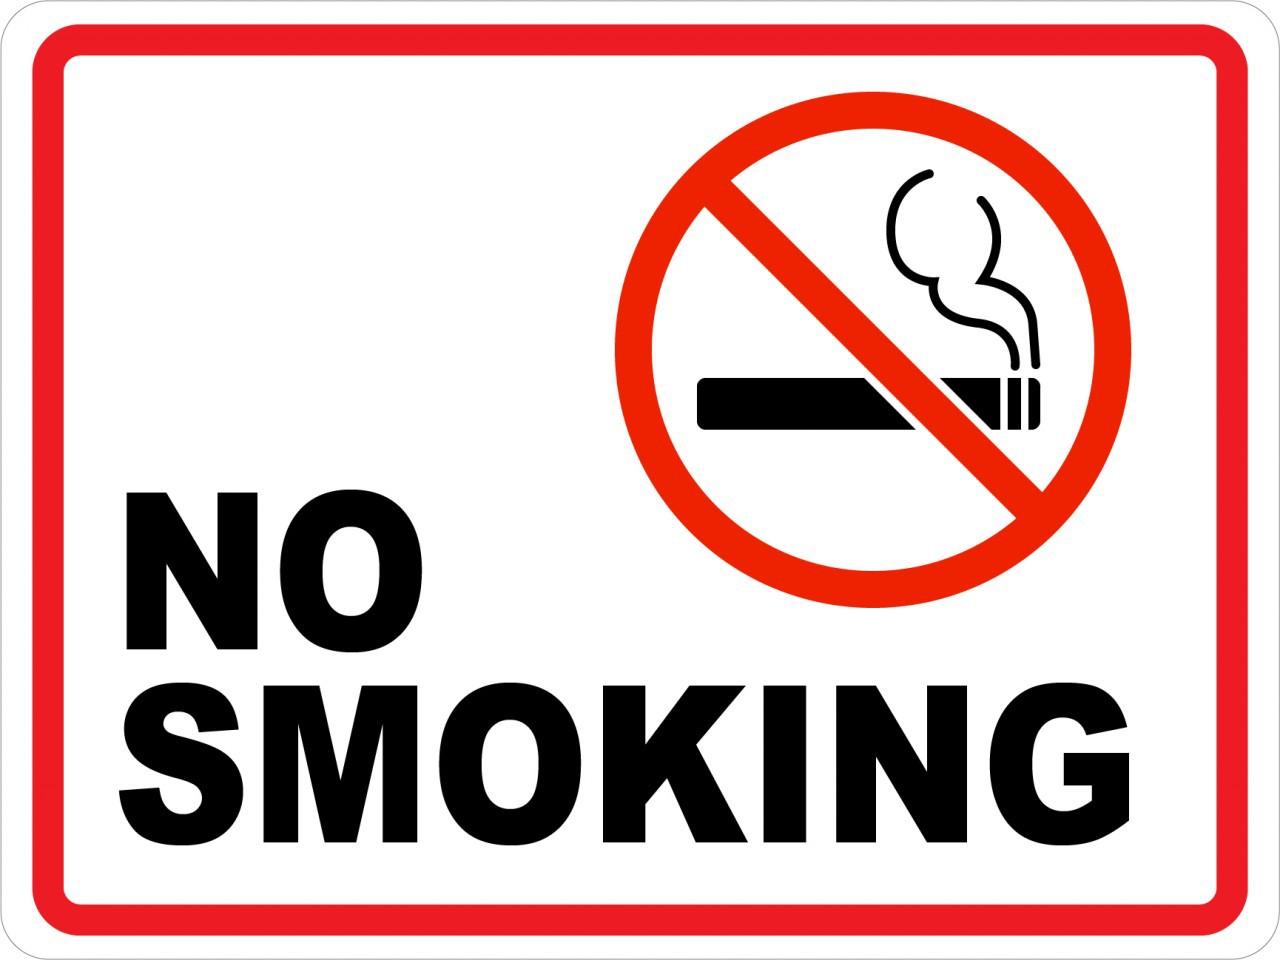 Smoking in White House